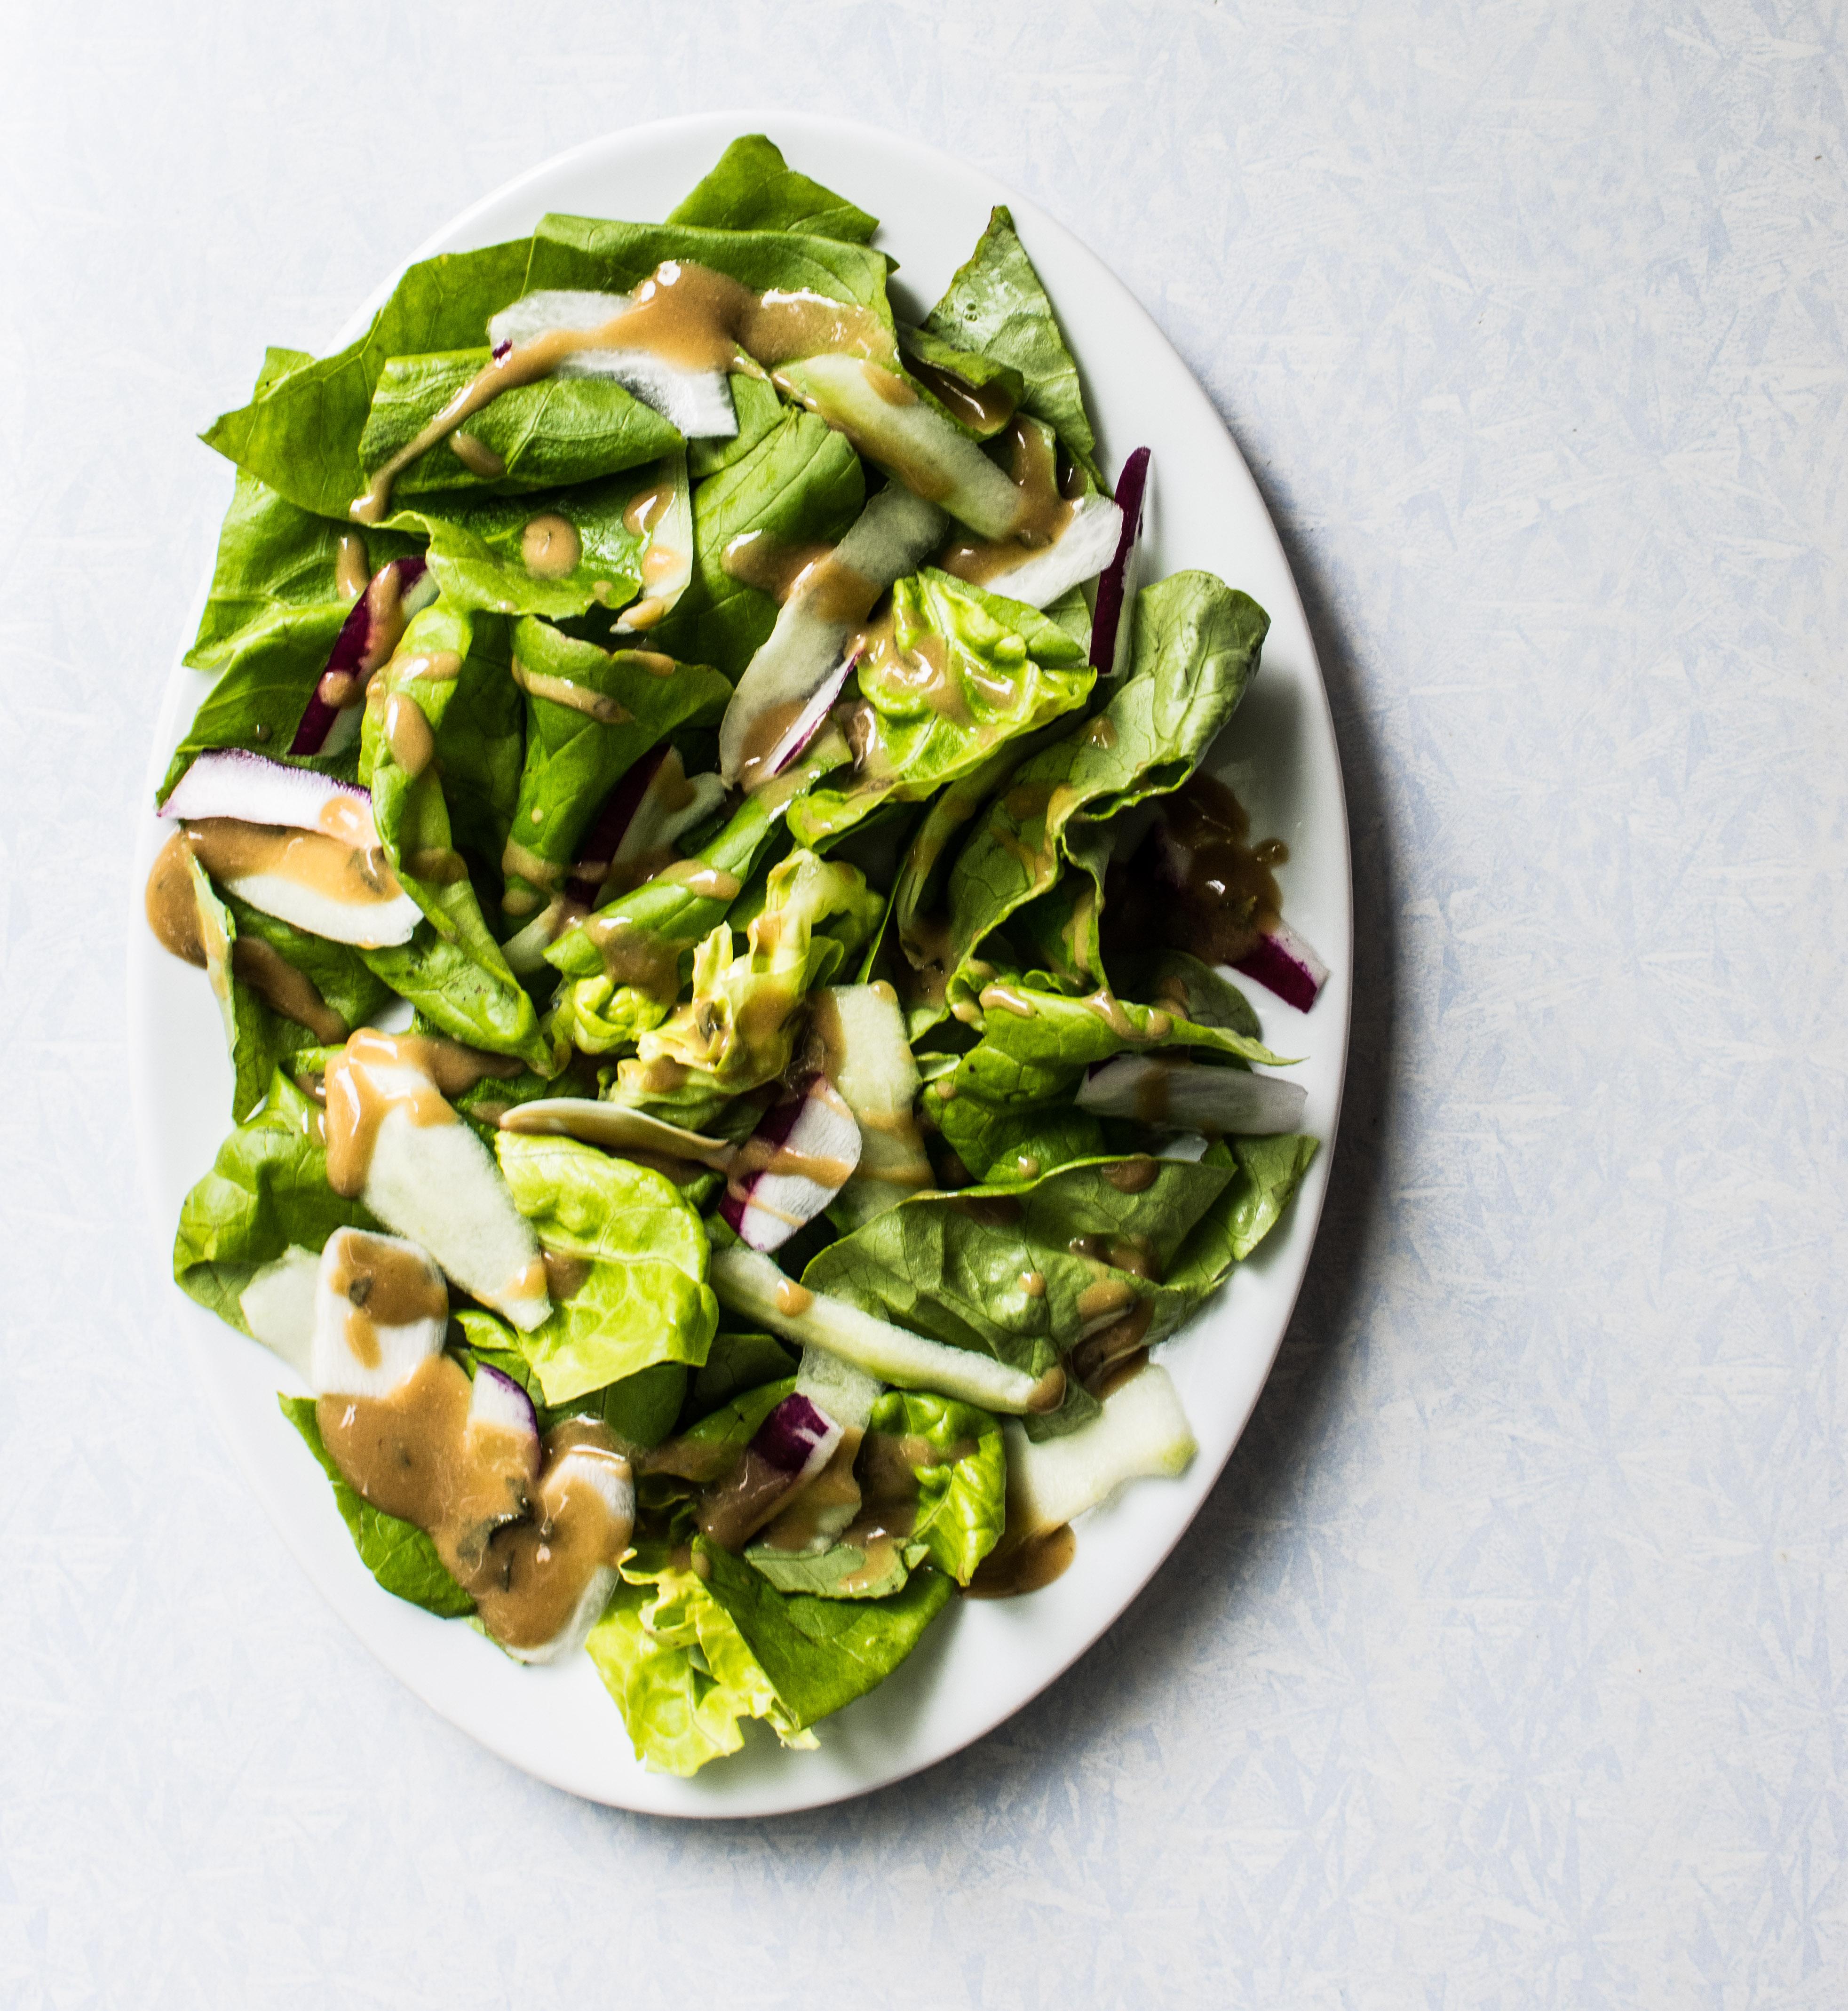 lettuce salads - 736×800